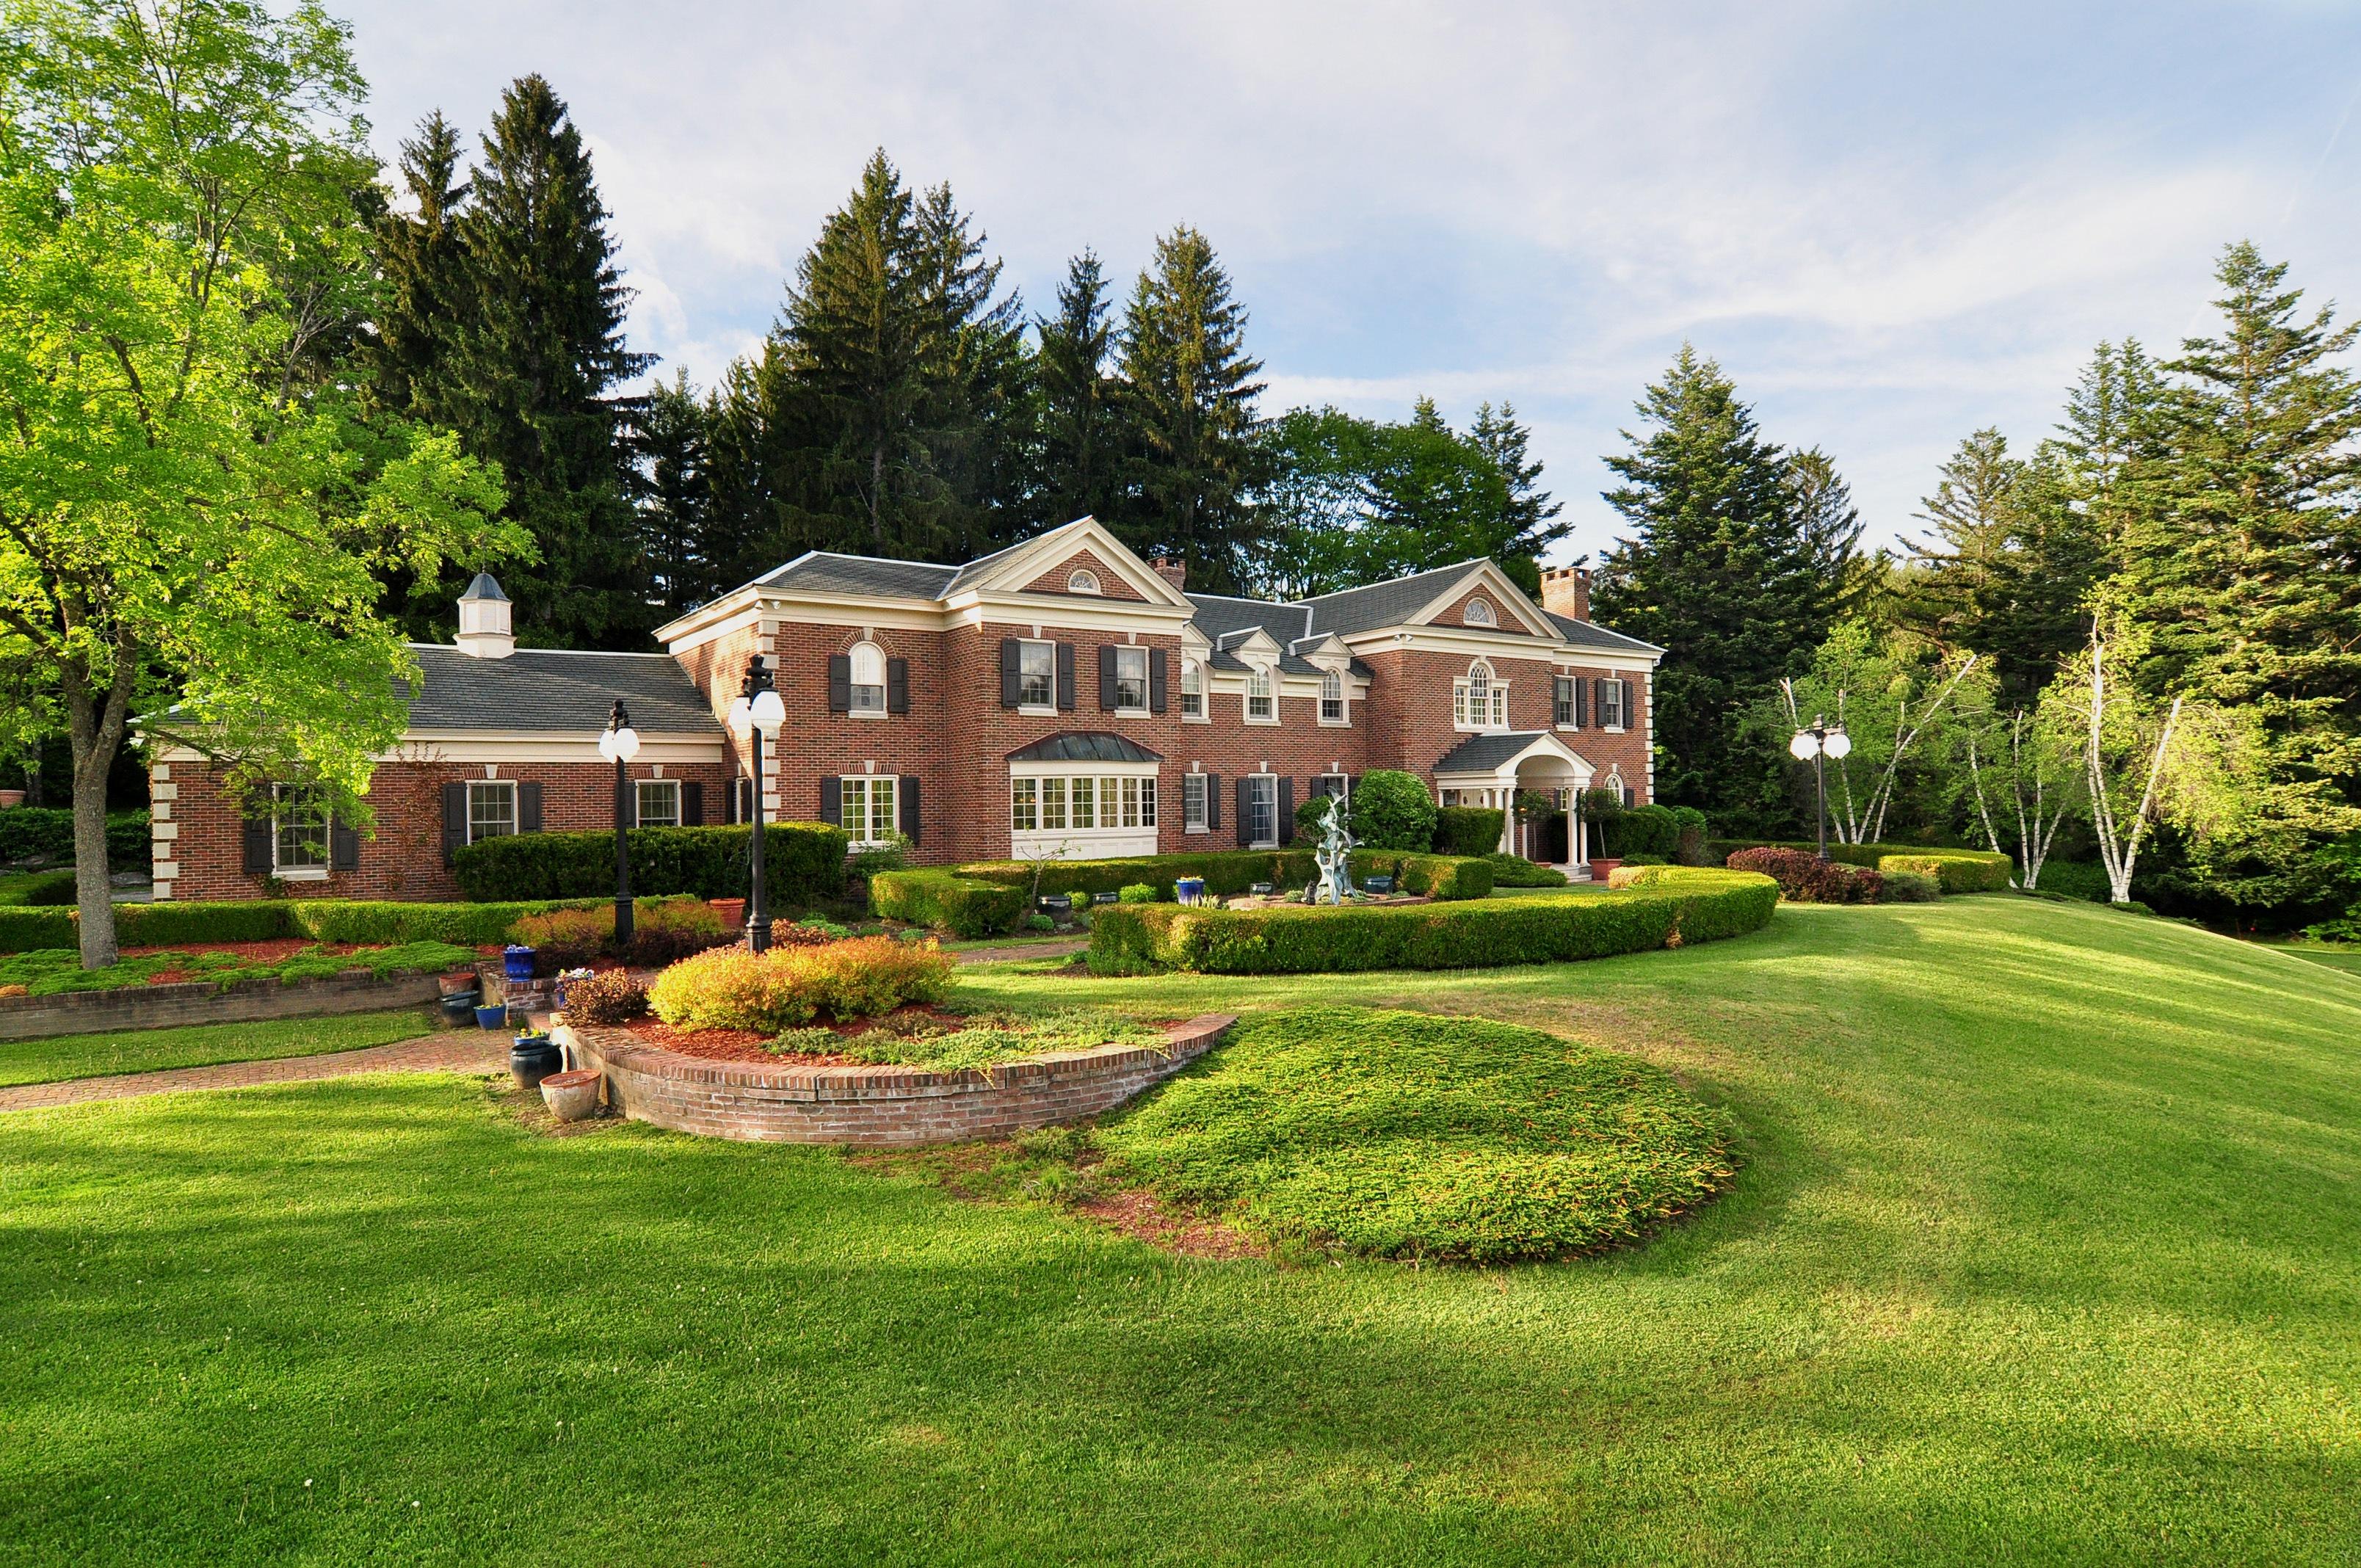 Single Family Home for Sale at Spectacular 36-acre Estate Steps from Tanglewood 79 Hawthorne St Stockbridge, Massachusetts, 01262 United States